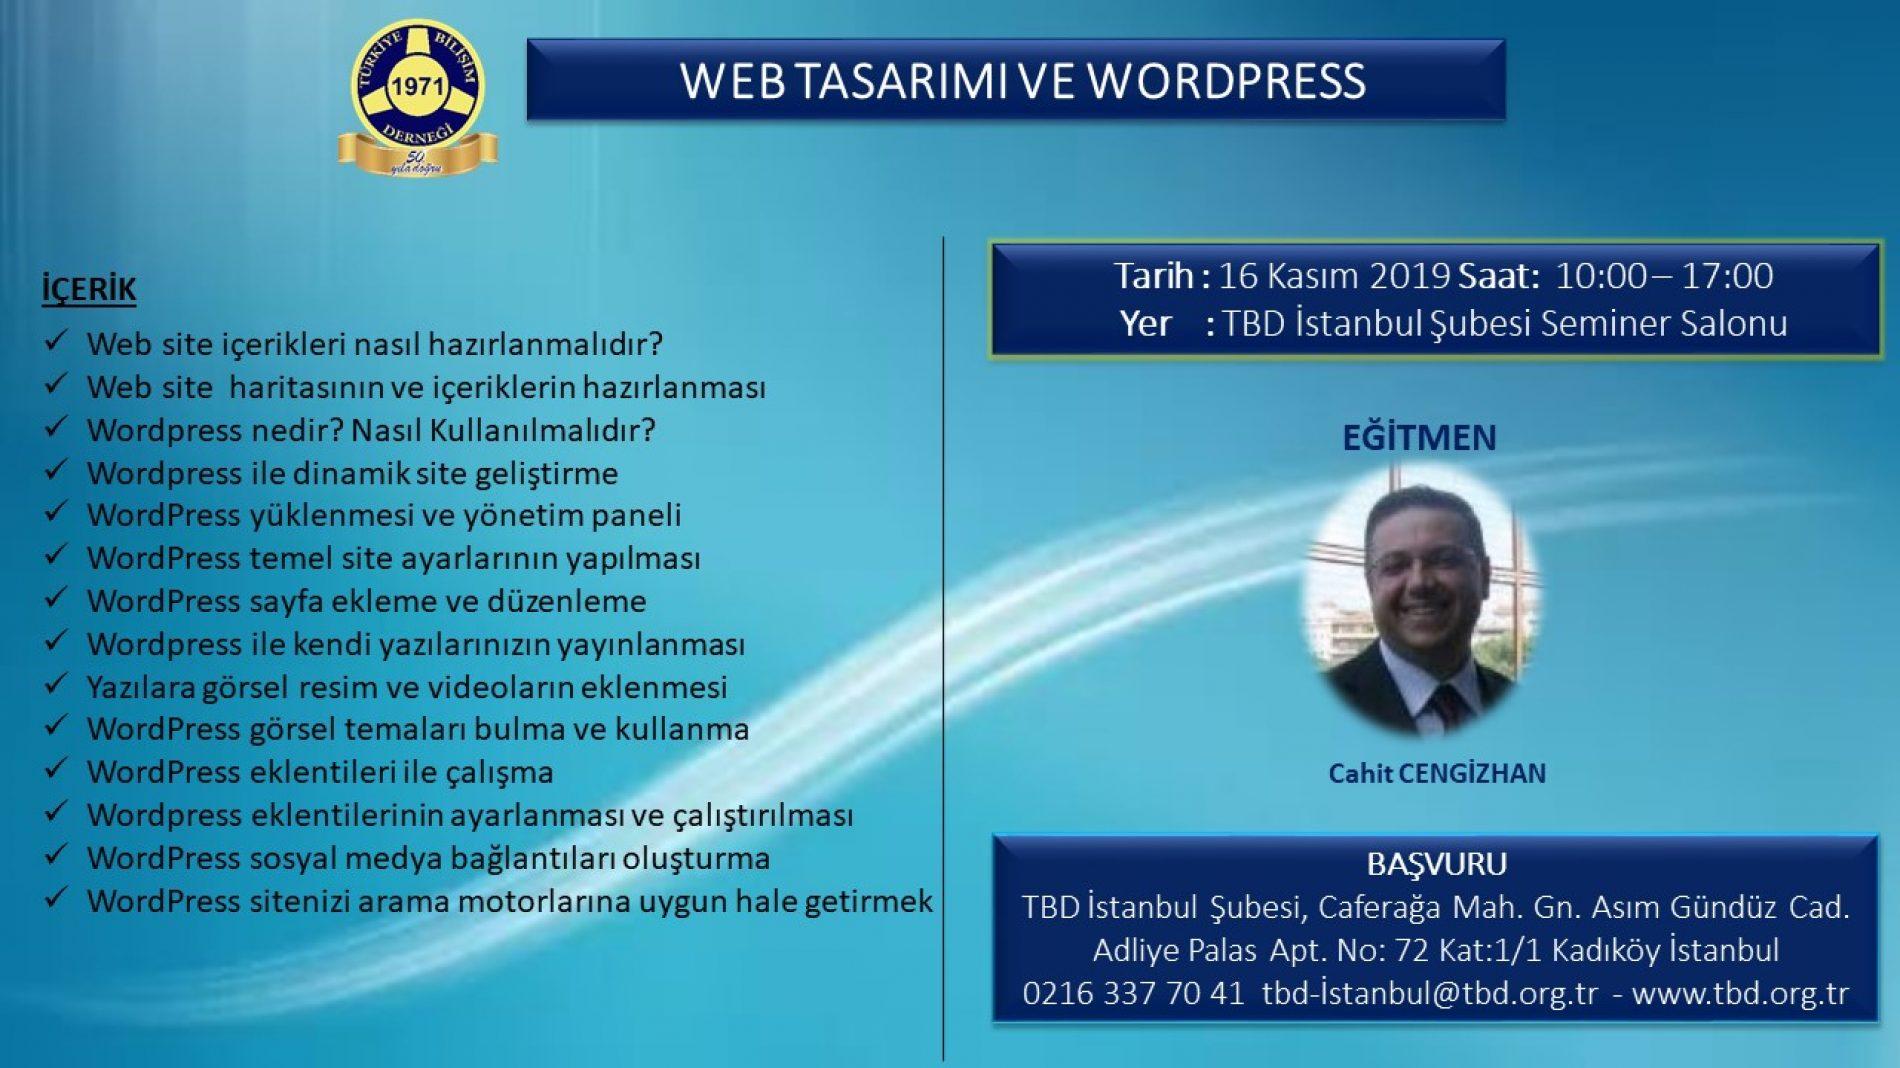 WEB TASARIMI VE WORDPRESS